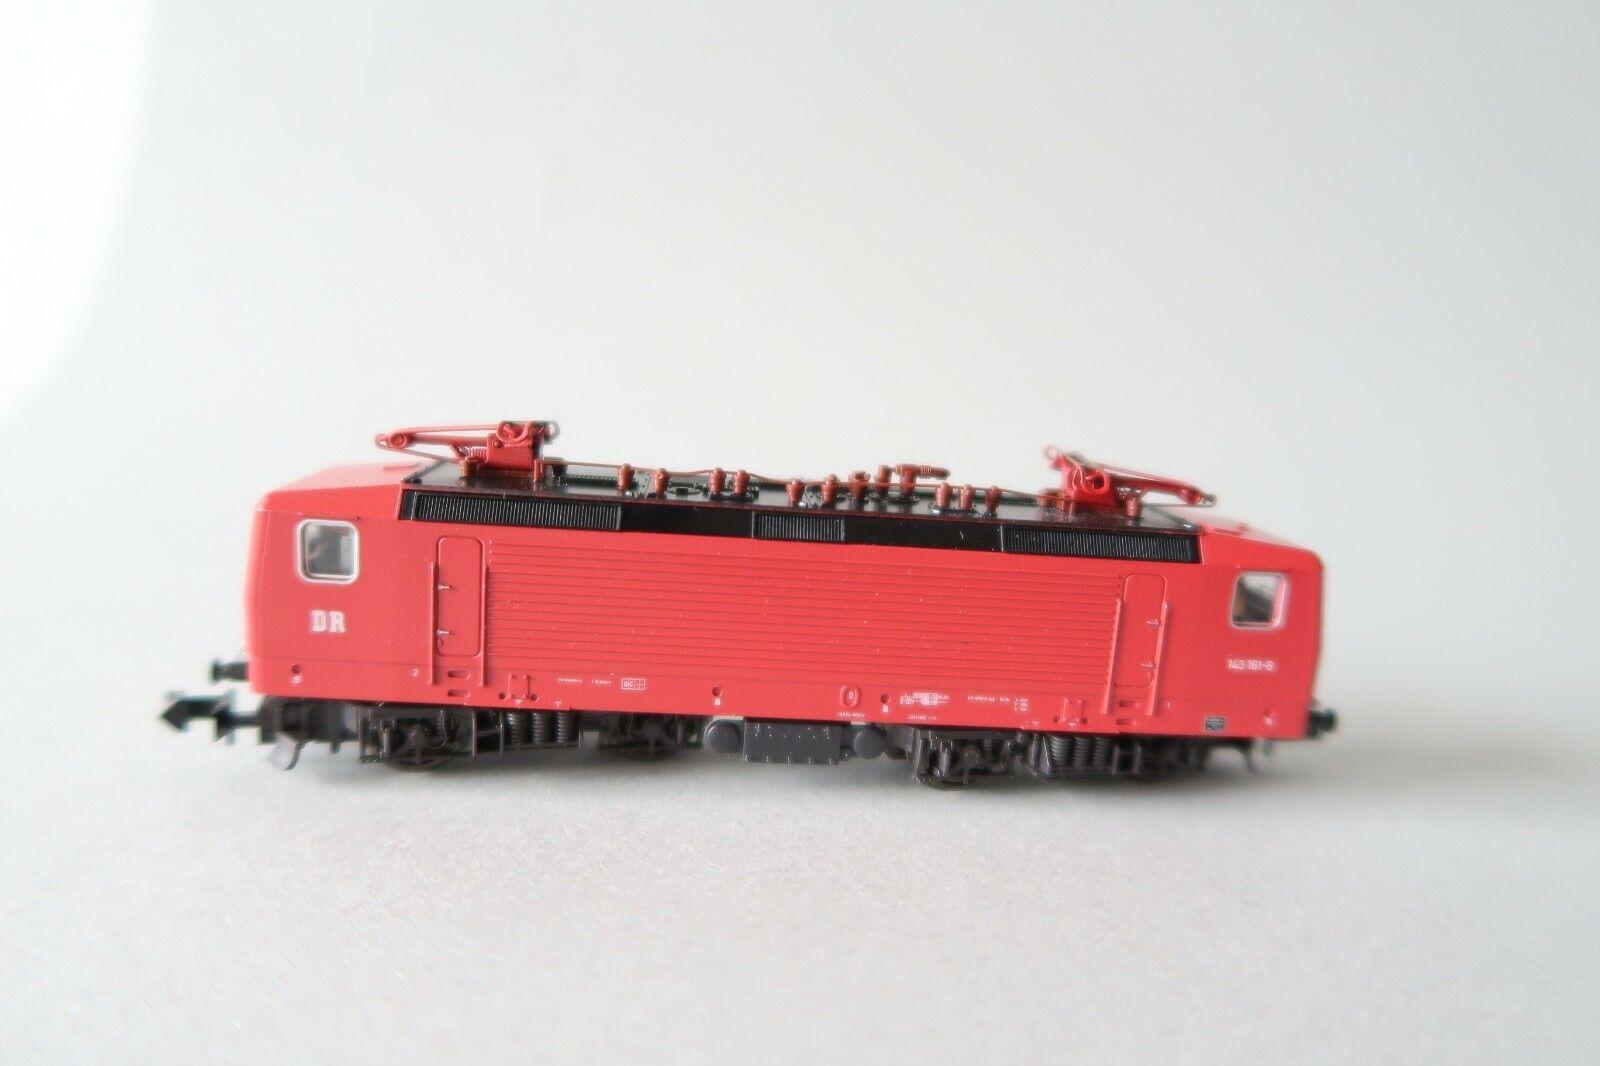 Minitrix N 12884 12884 12884 E - Lok BR 143 161-8 DB   Neues DB Farbschema   (DV028-41S4 2)    Zu einem niedrigeren Preis  b9adde